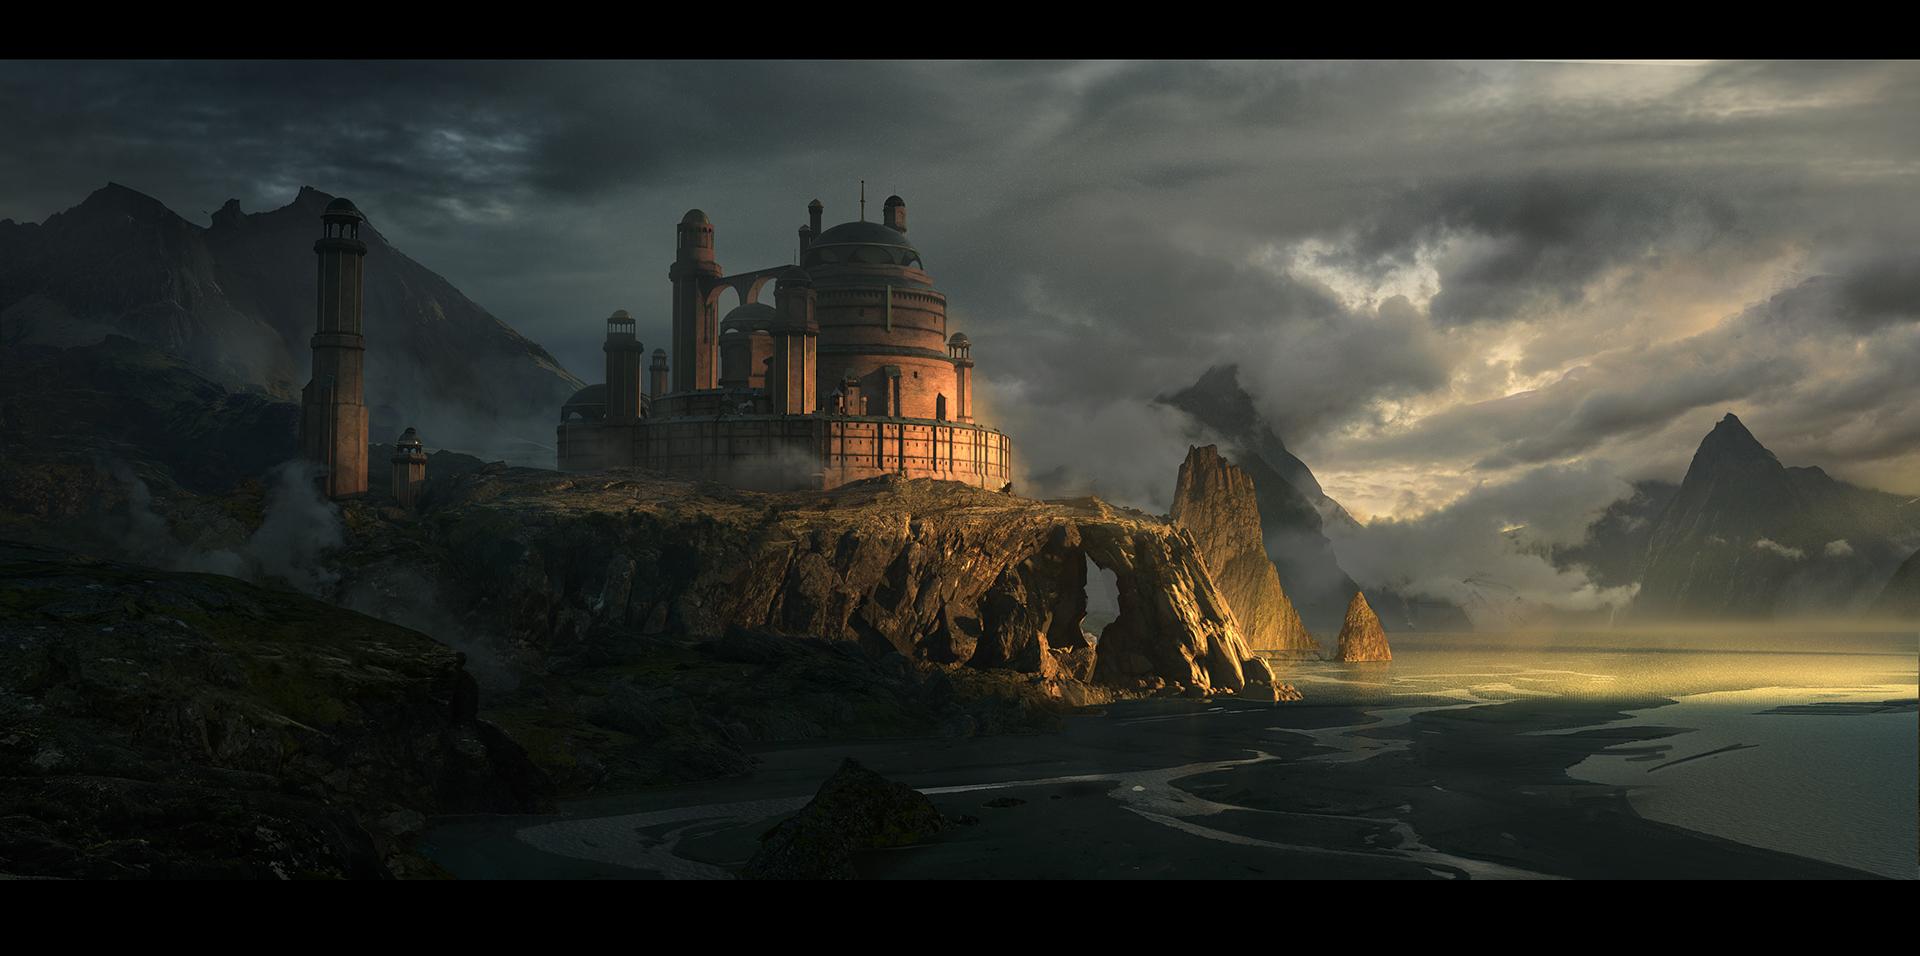 Castle_exterior_Martin_Faragasso.jpg